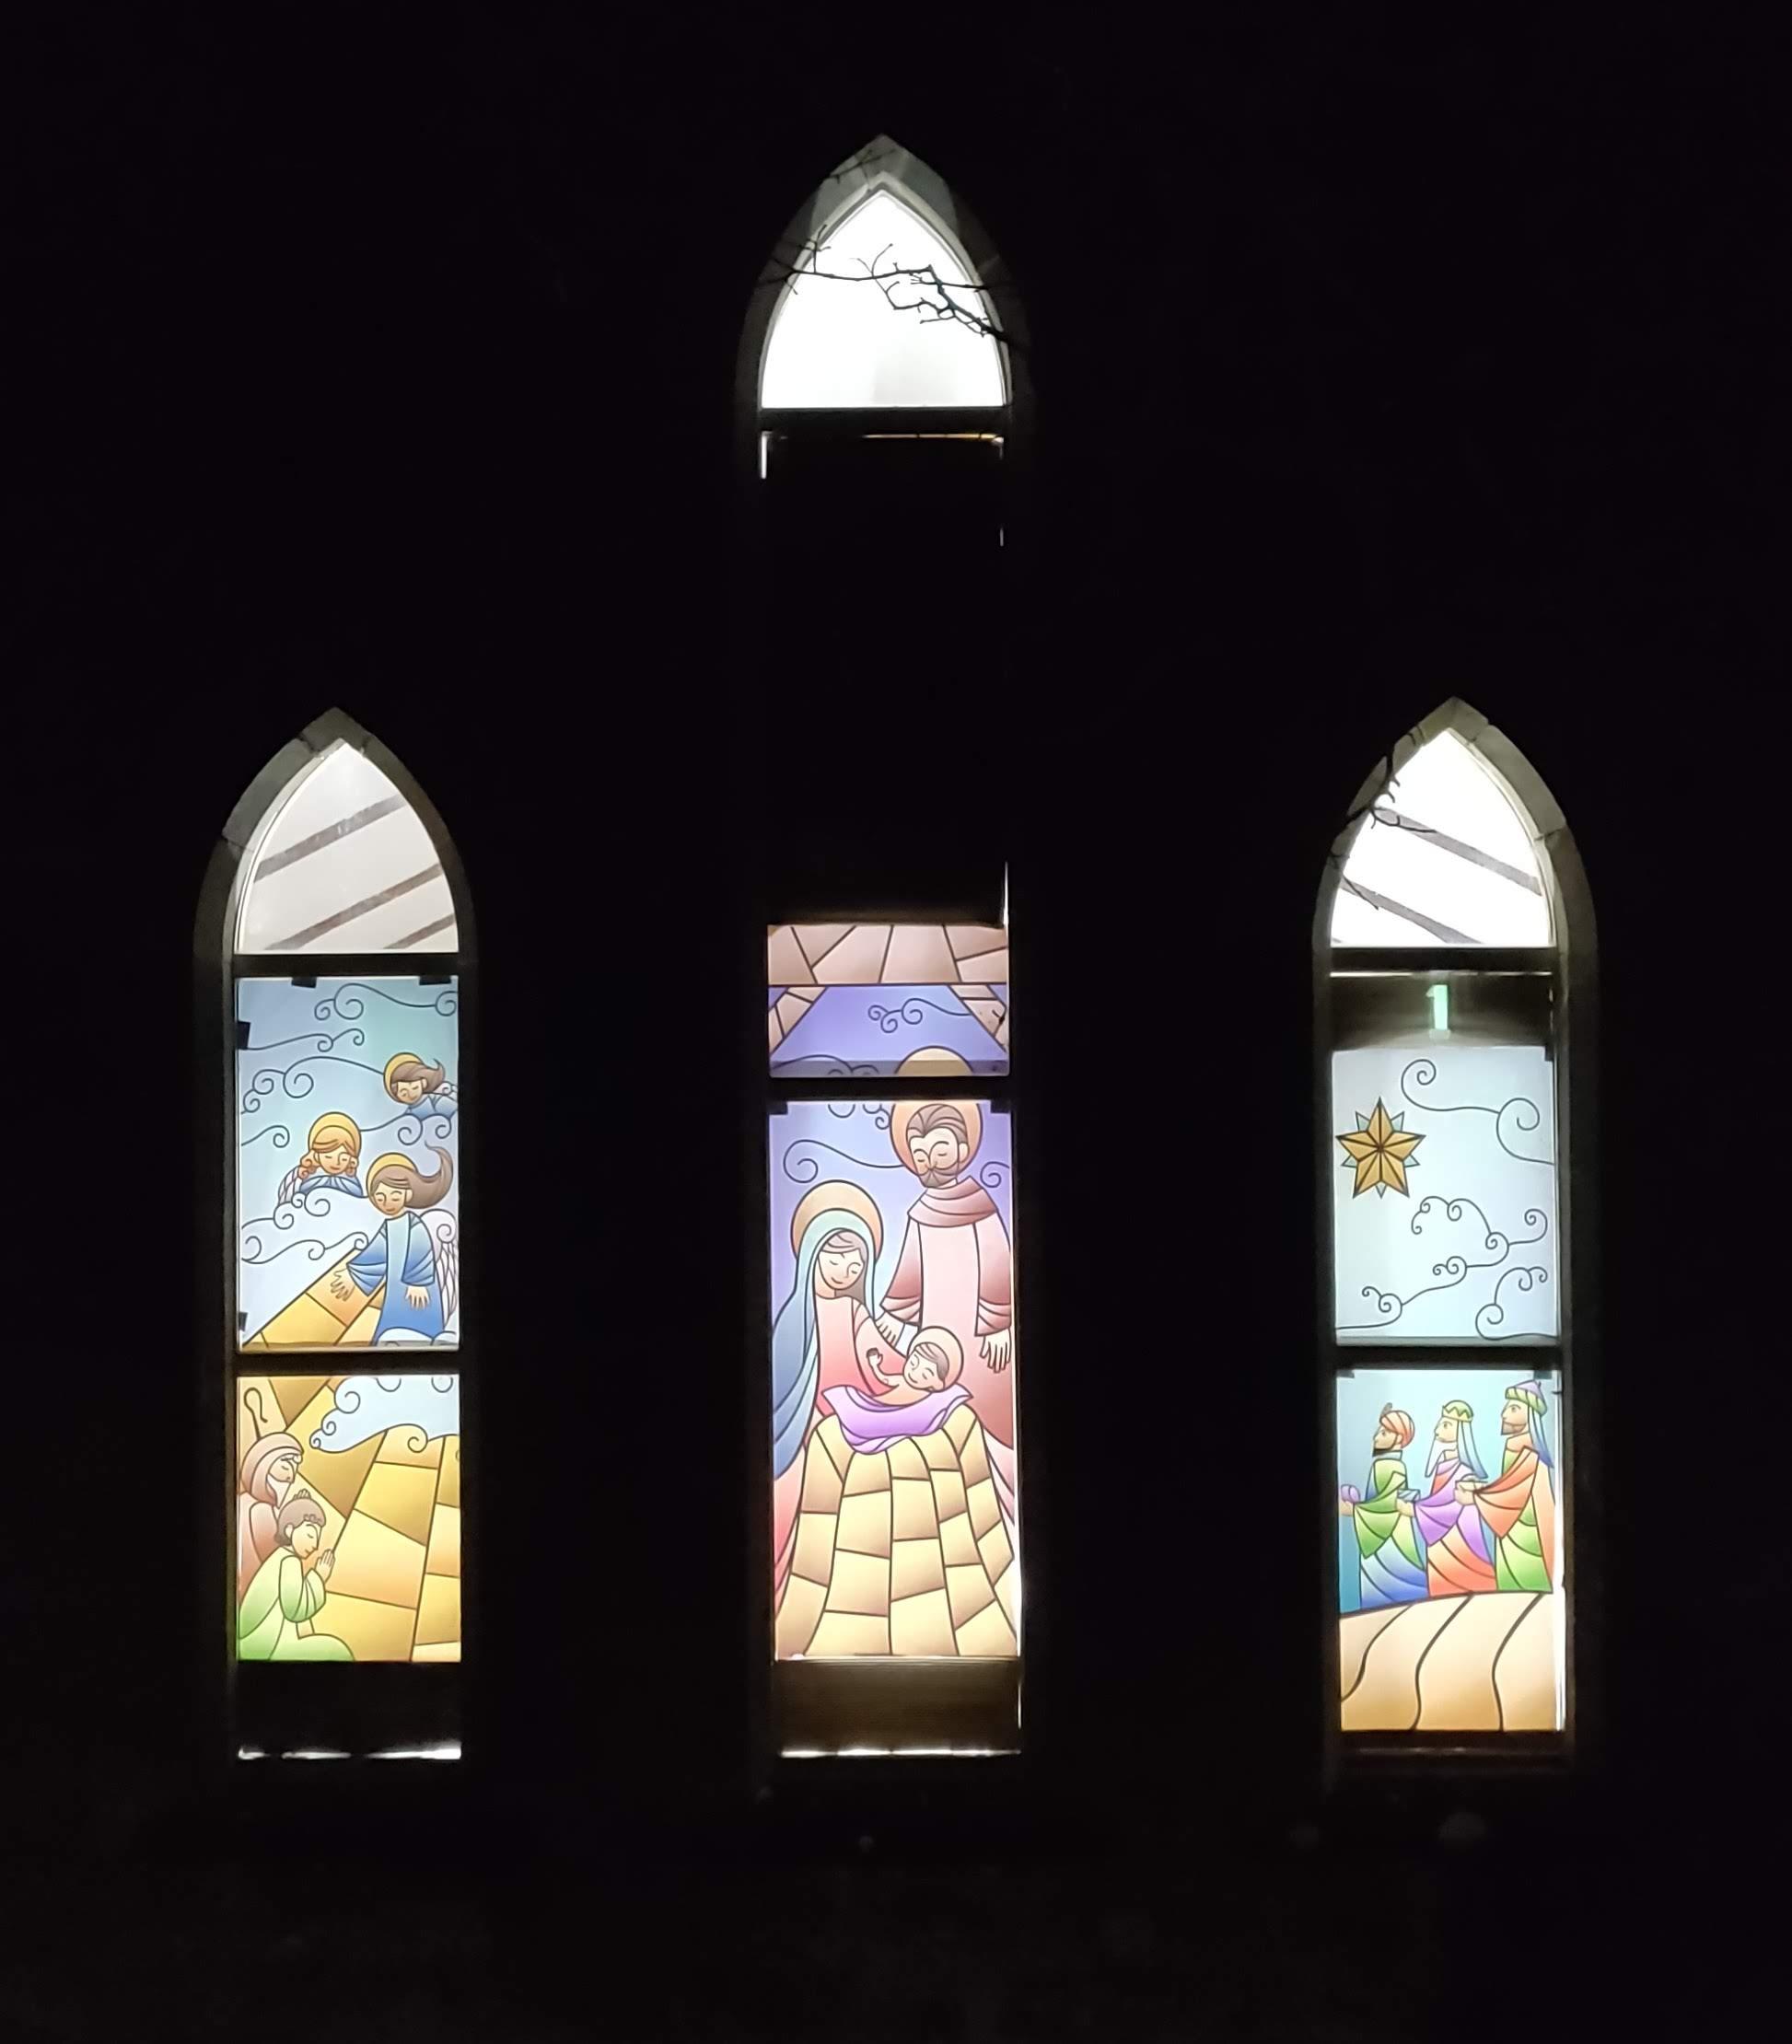 Stained glass nativity scene in church windows